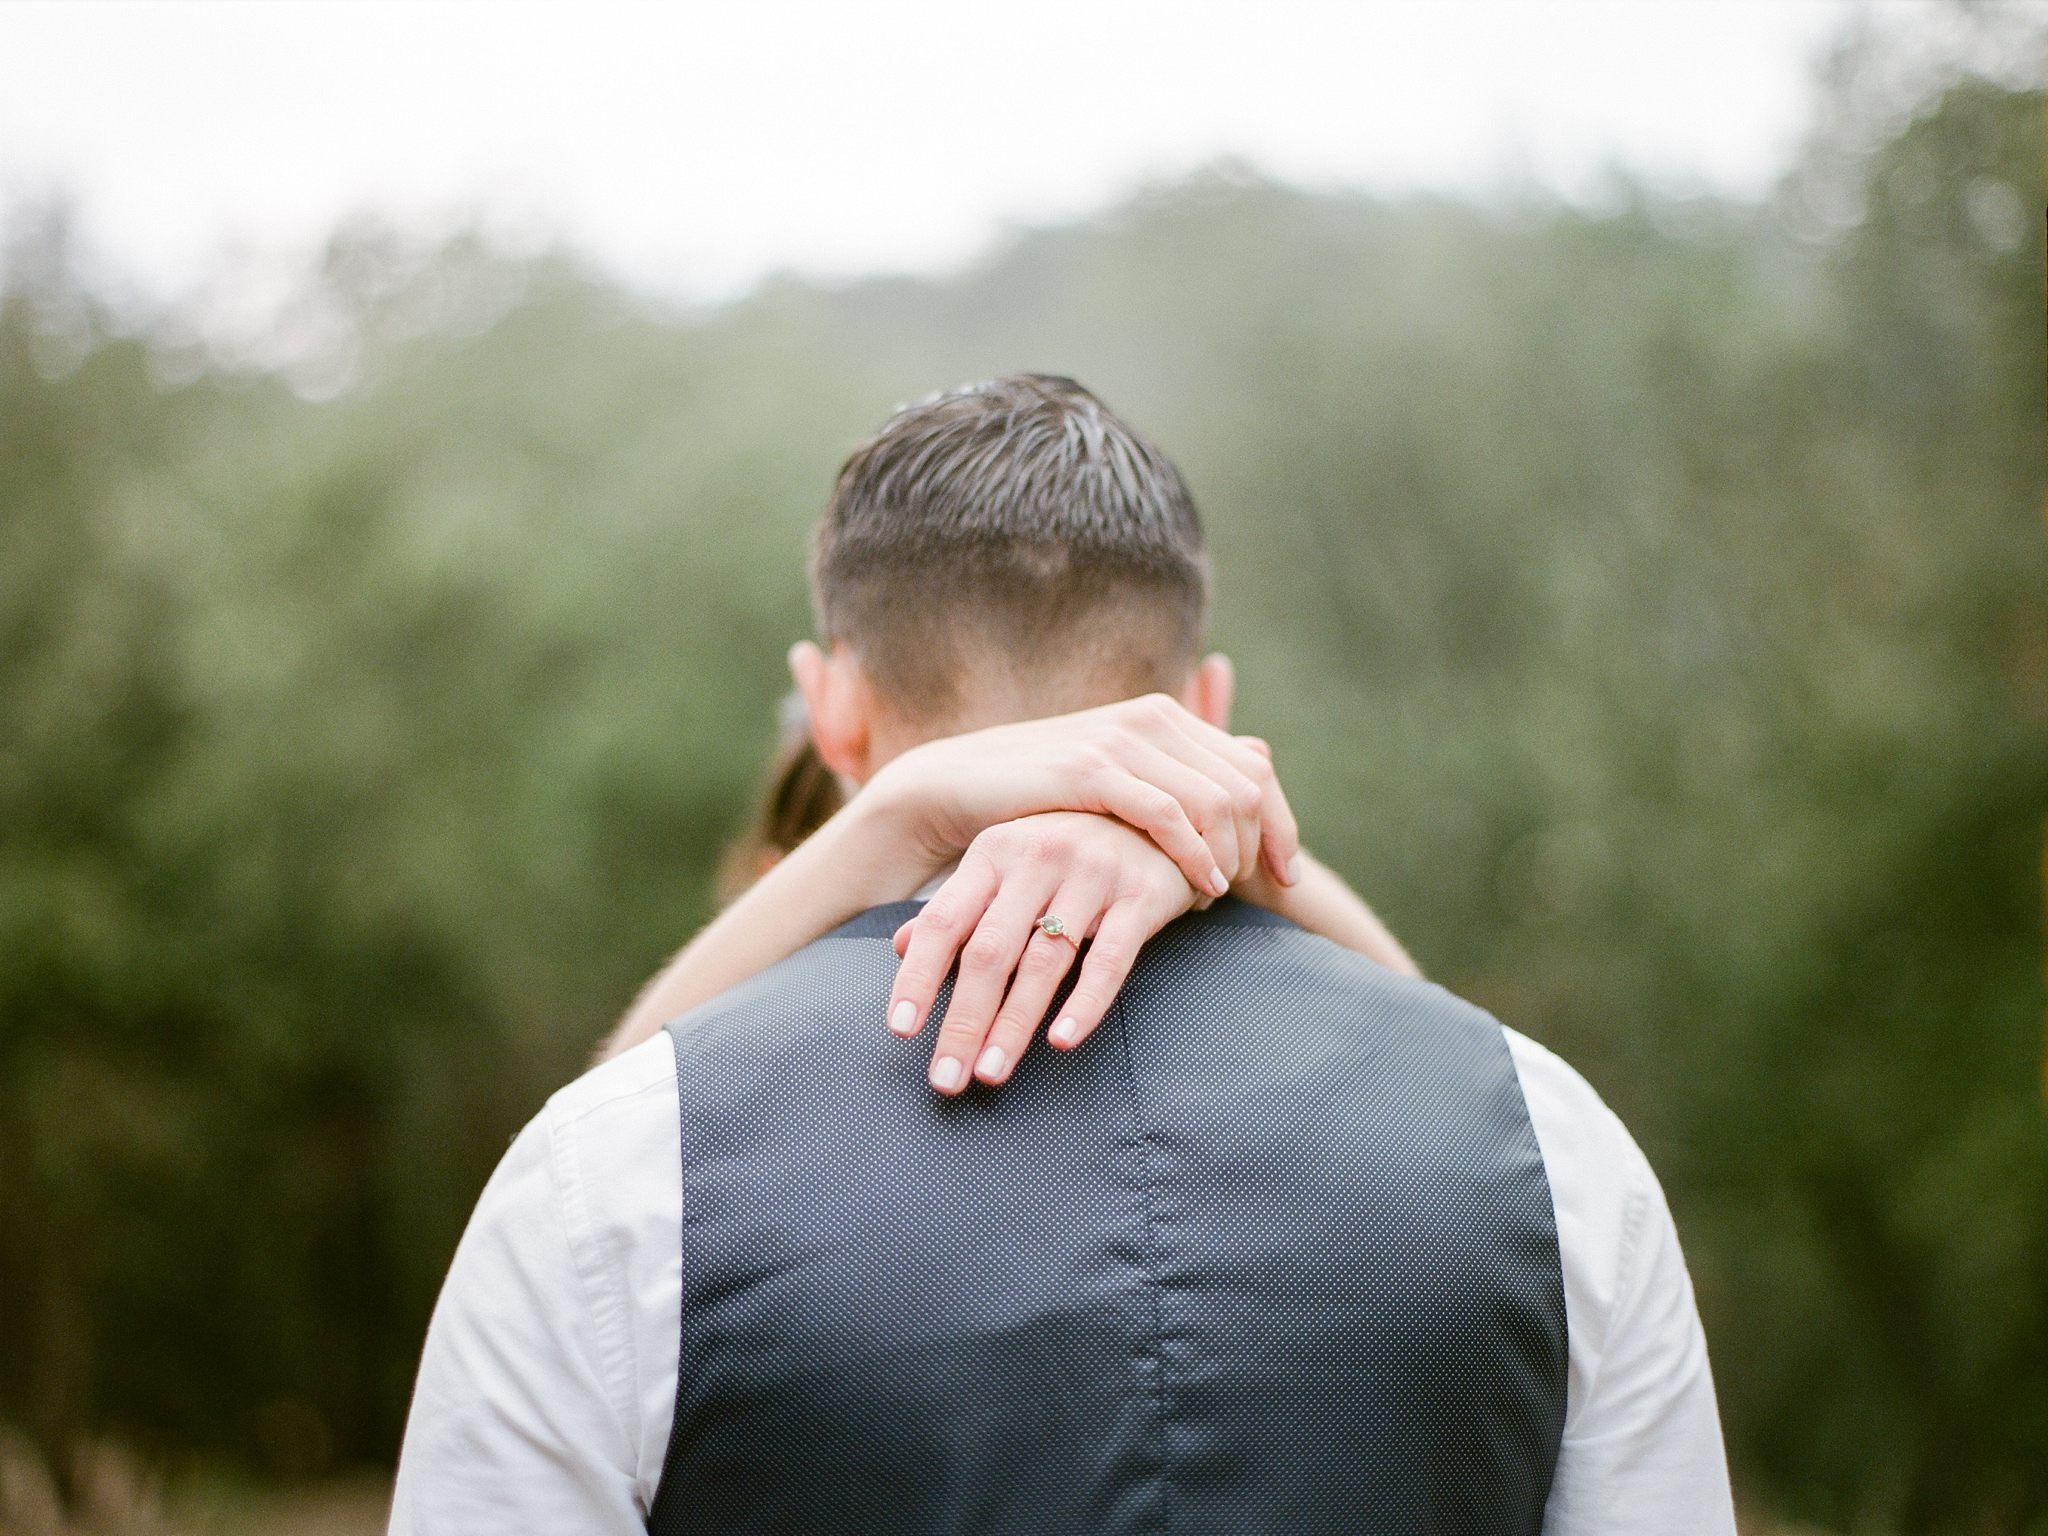 Mariage-a-la-maison-secall-hugo-hennequin-photographe-mariage-perpignan_0118.jpg